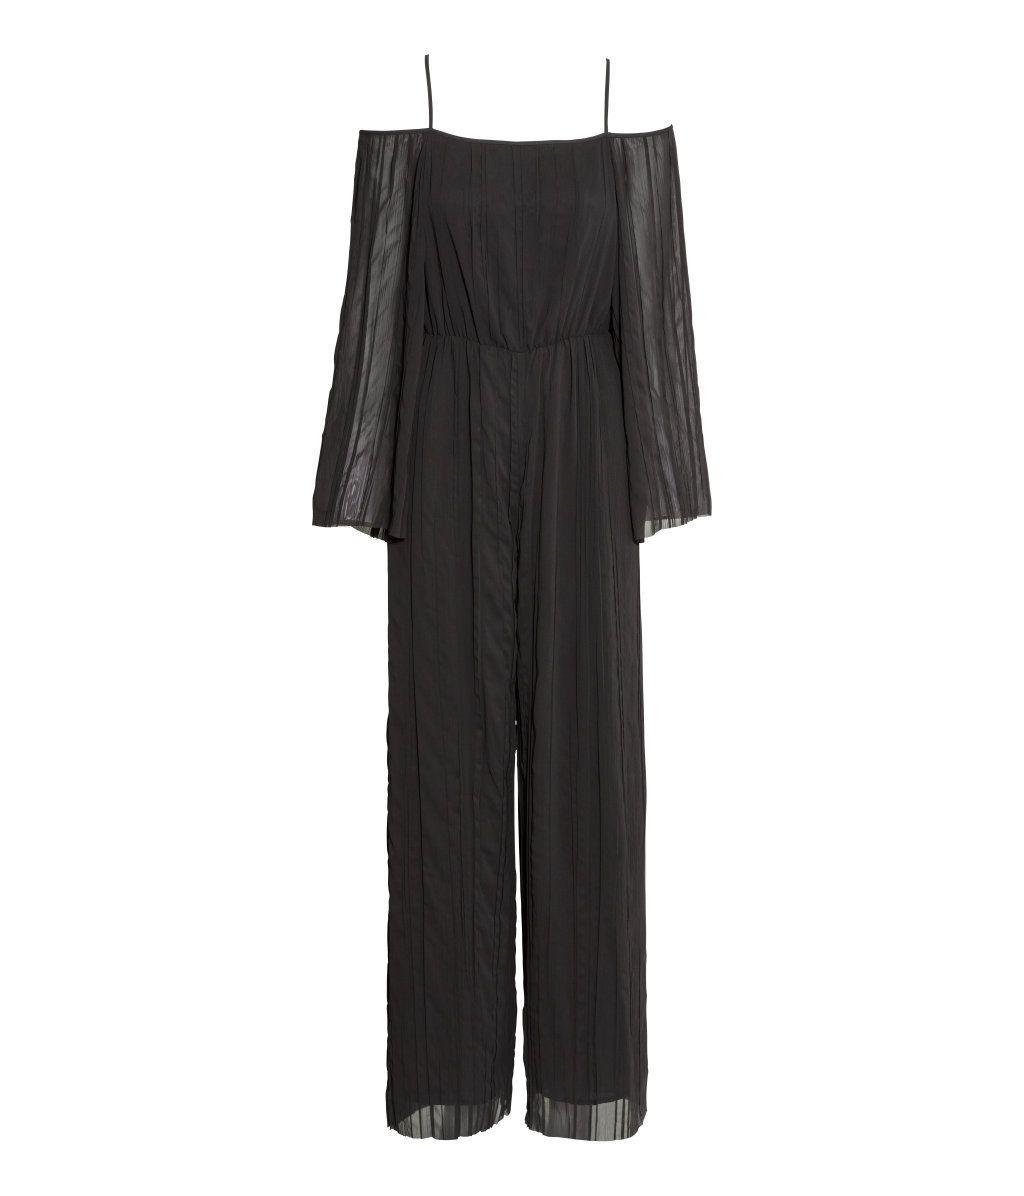 Sort. En plissért jumpsuit i chiffon med vide ermer og ben. Den har bare skuldre og smale skulderbånd. Dypt v-ringet rygg. Avskåret i midjen med elastikk. F